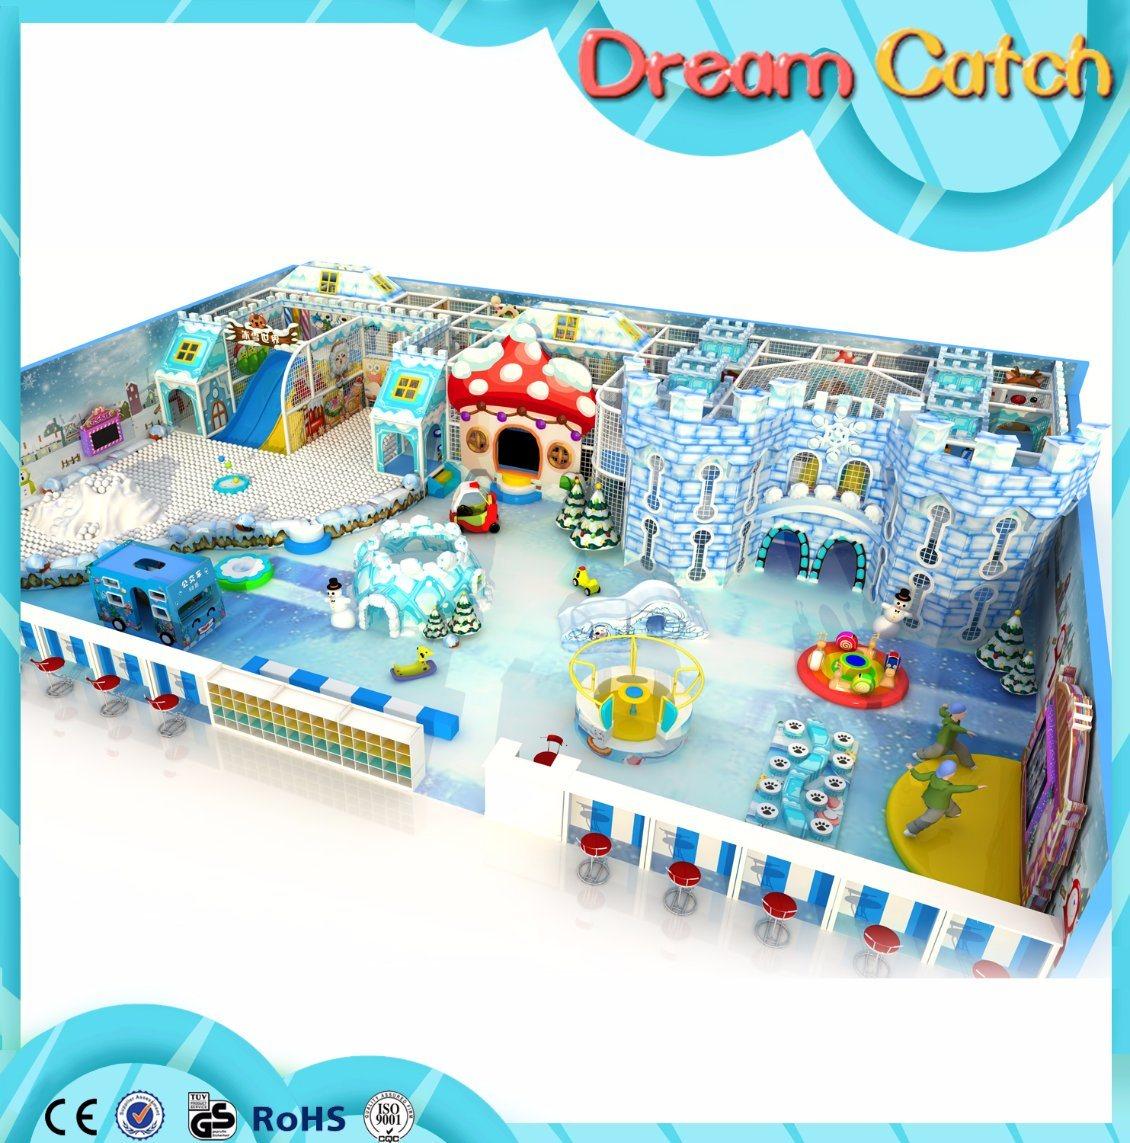 Rocket Series Kids Indoor Playground Manufacturer in Guangzhou